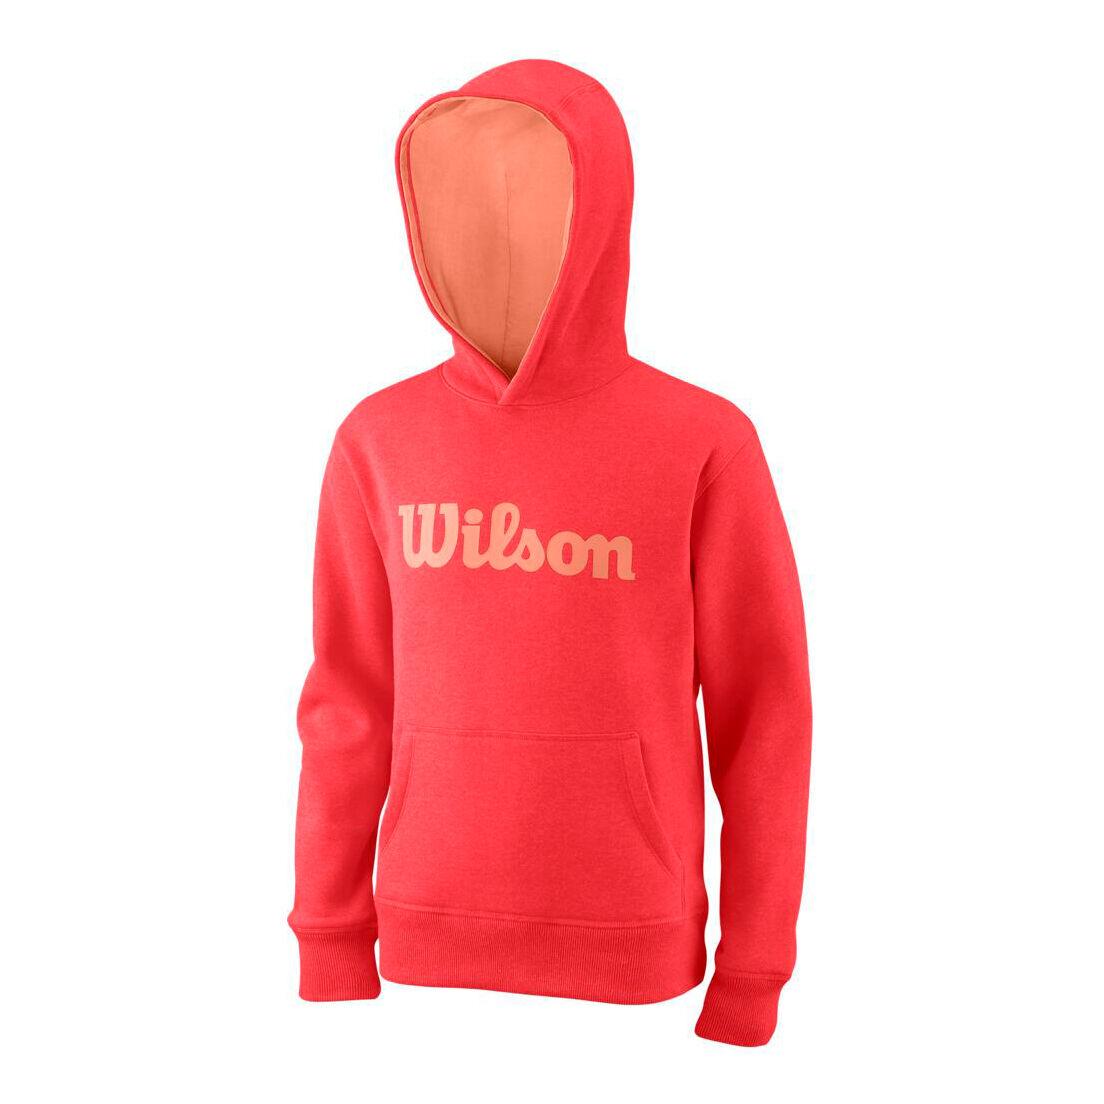 Wilson Script Cotton Po Hoody blau Kapuzenpullover UVP 50,00€ NEU